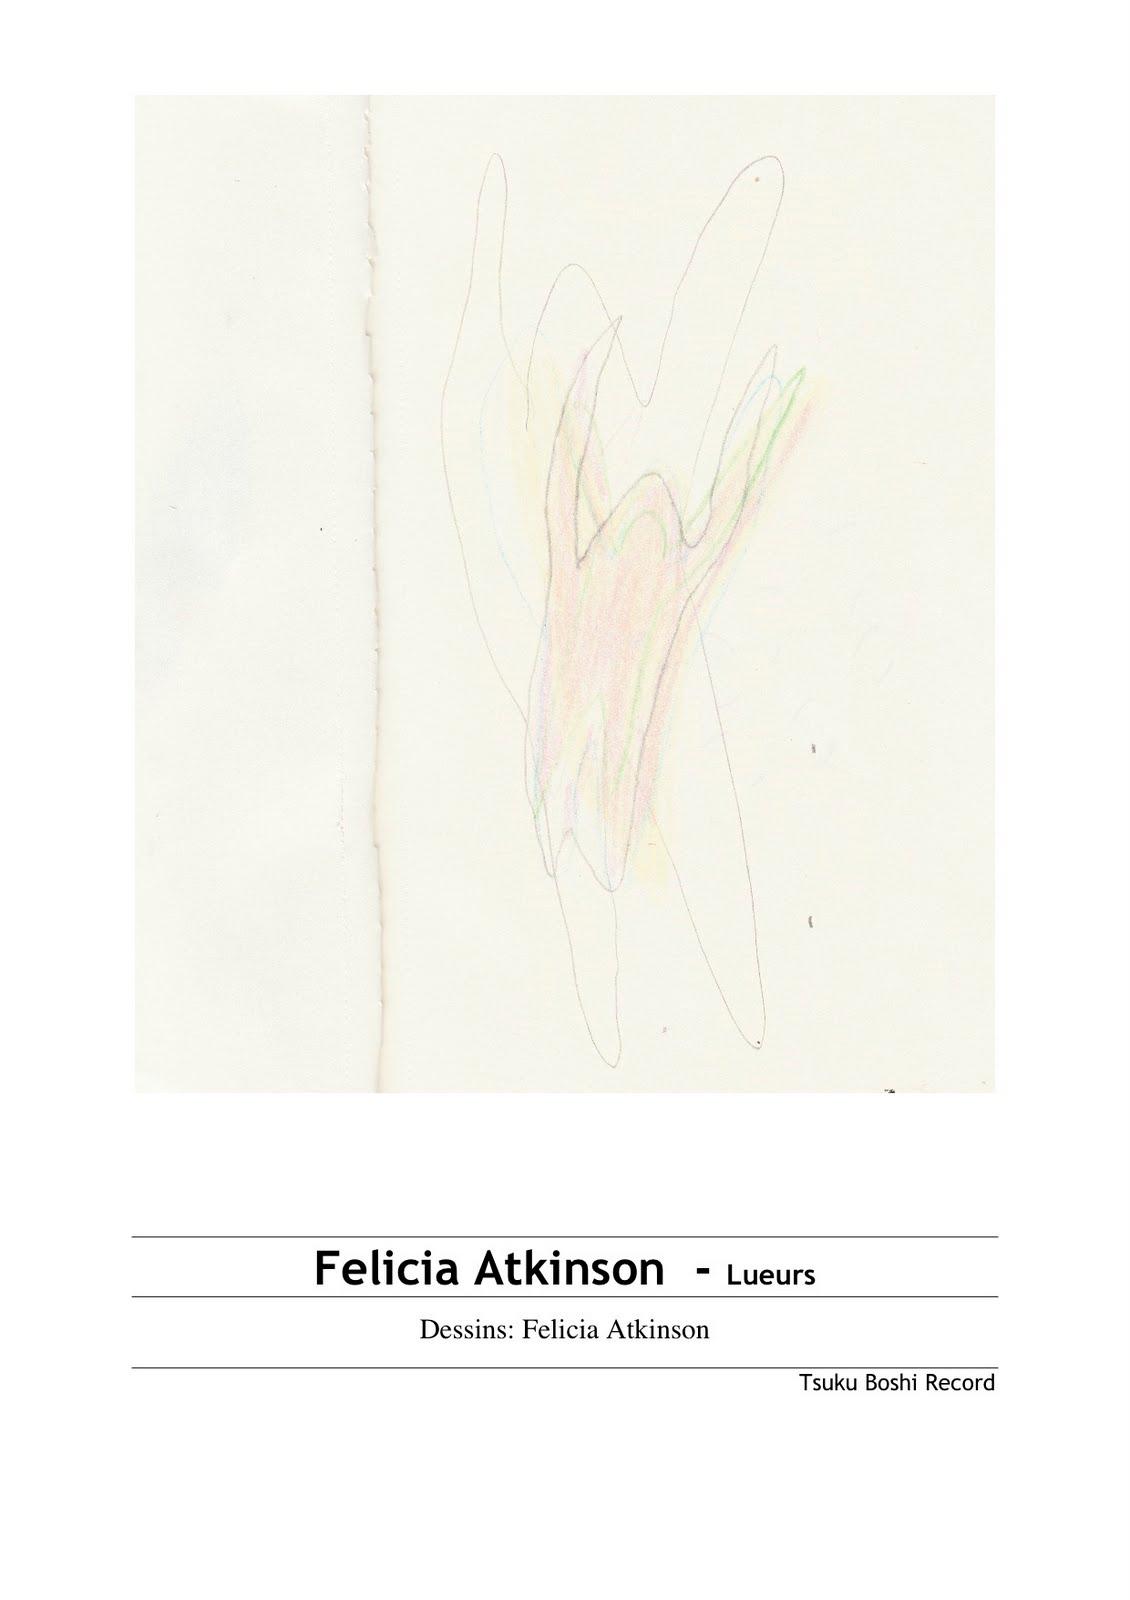 [Felicia+Atkinson_Lueurs_Pochette-792475.jpg]